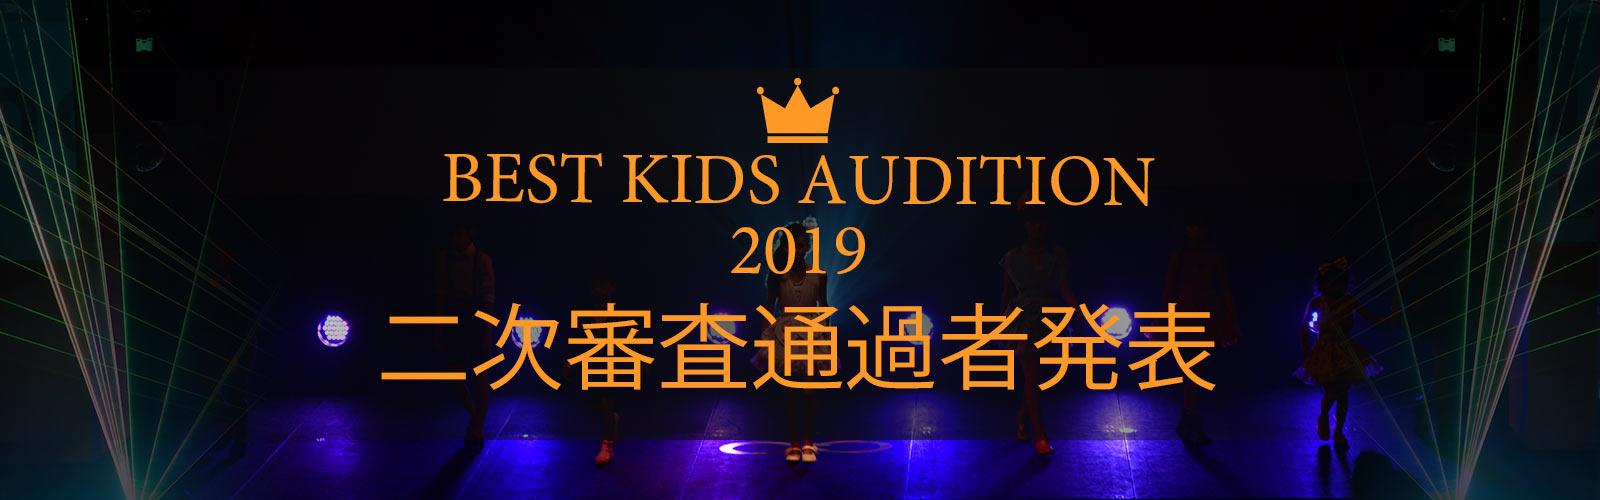 BEST KIDS AUDITION 2019 二次審査通過者発表